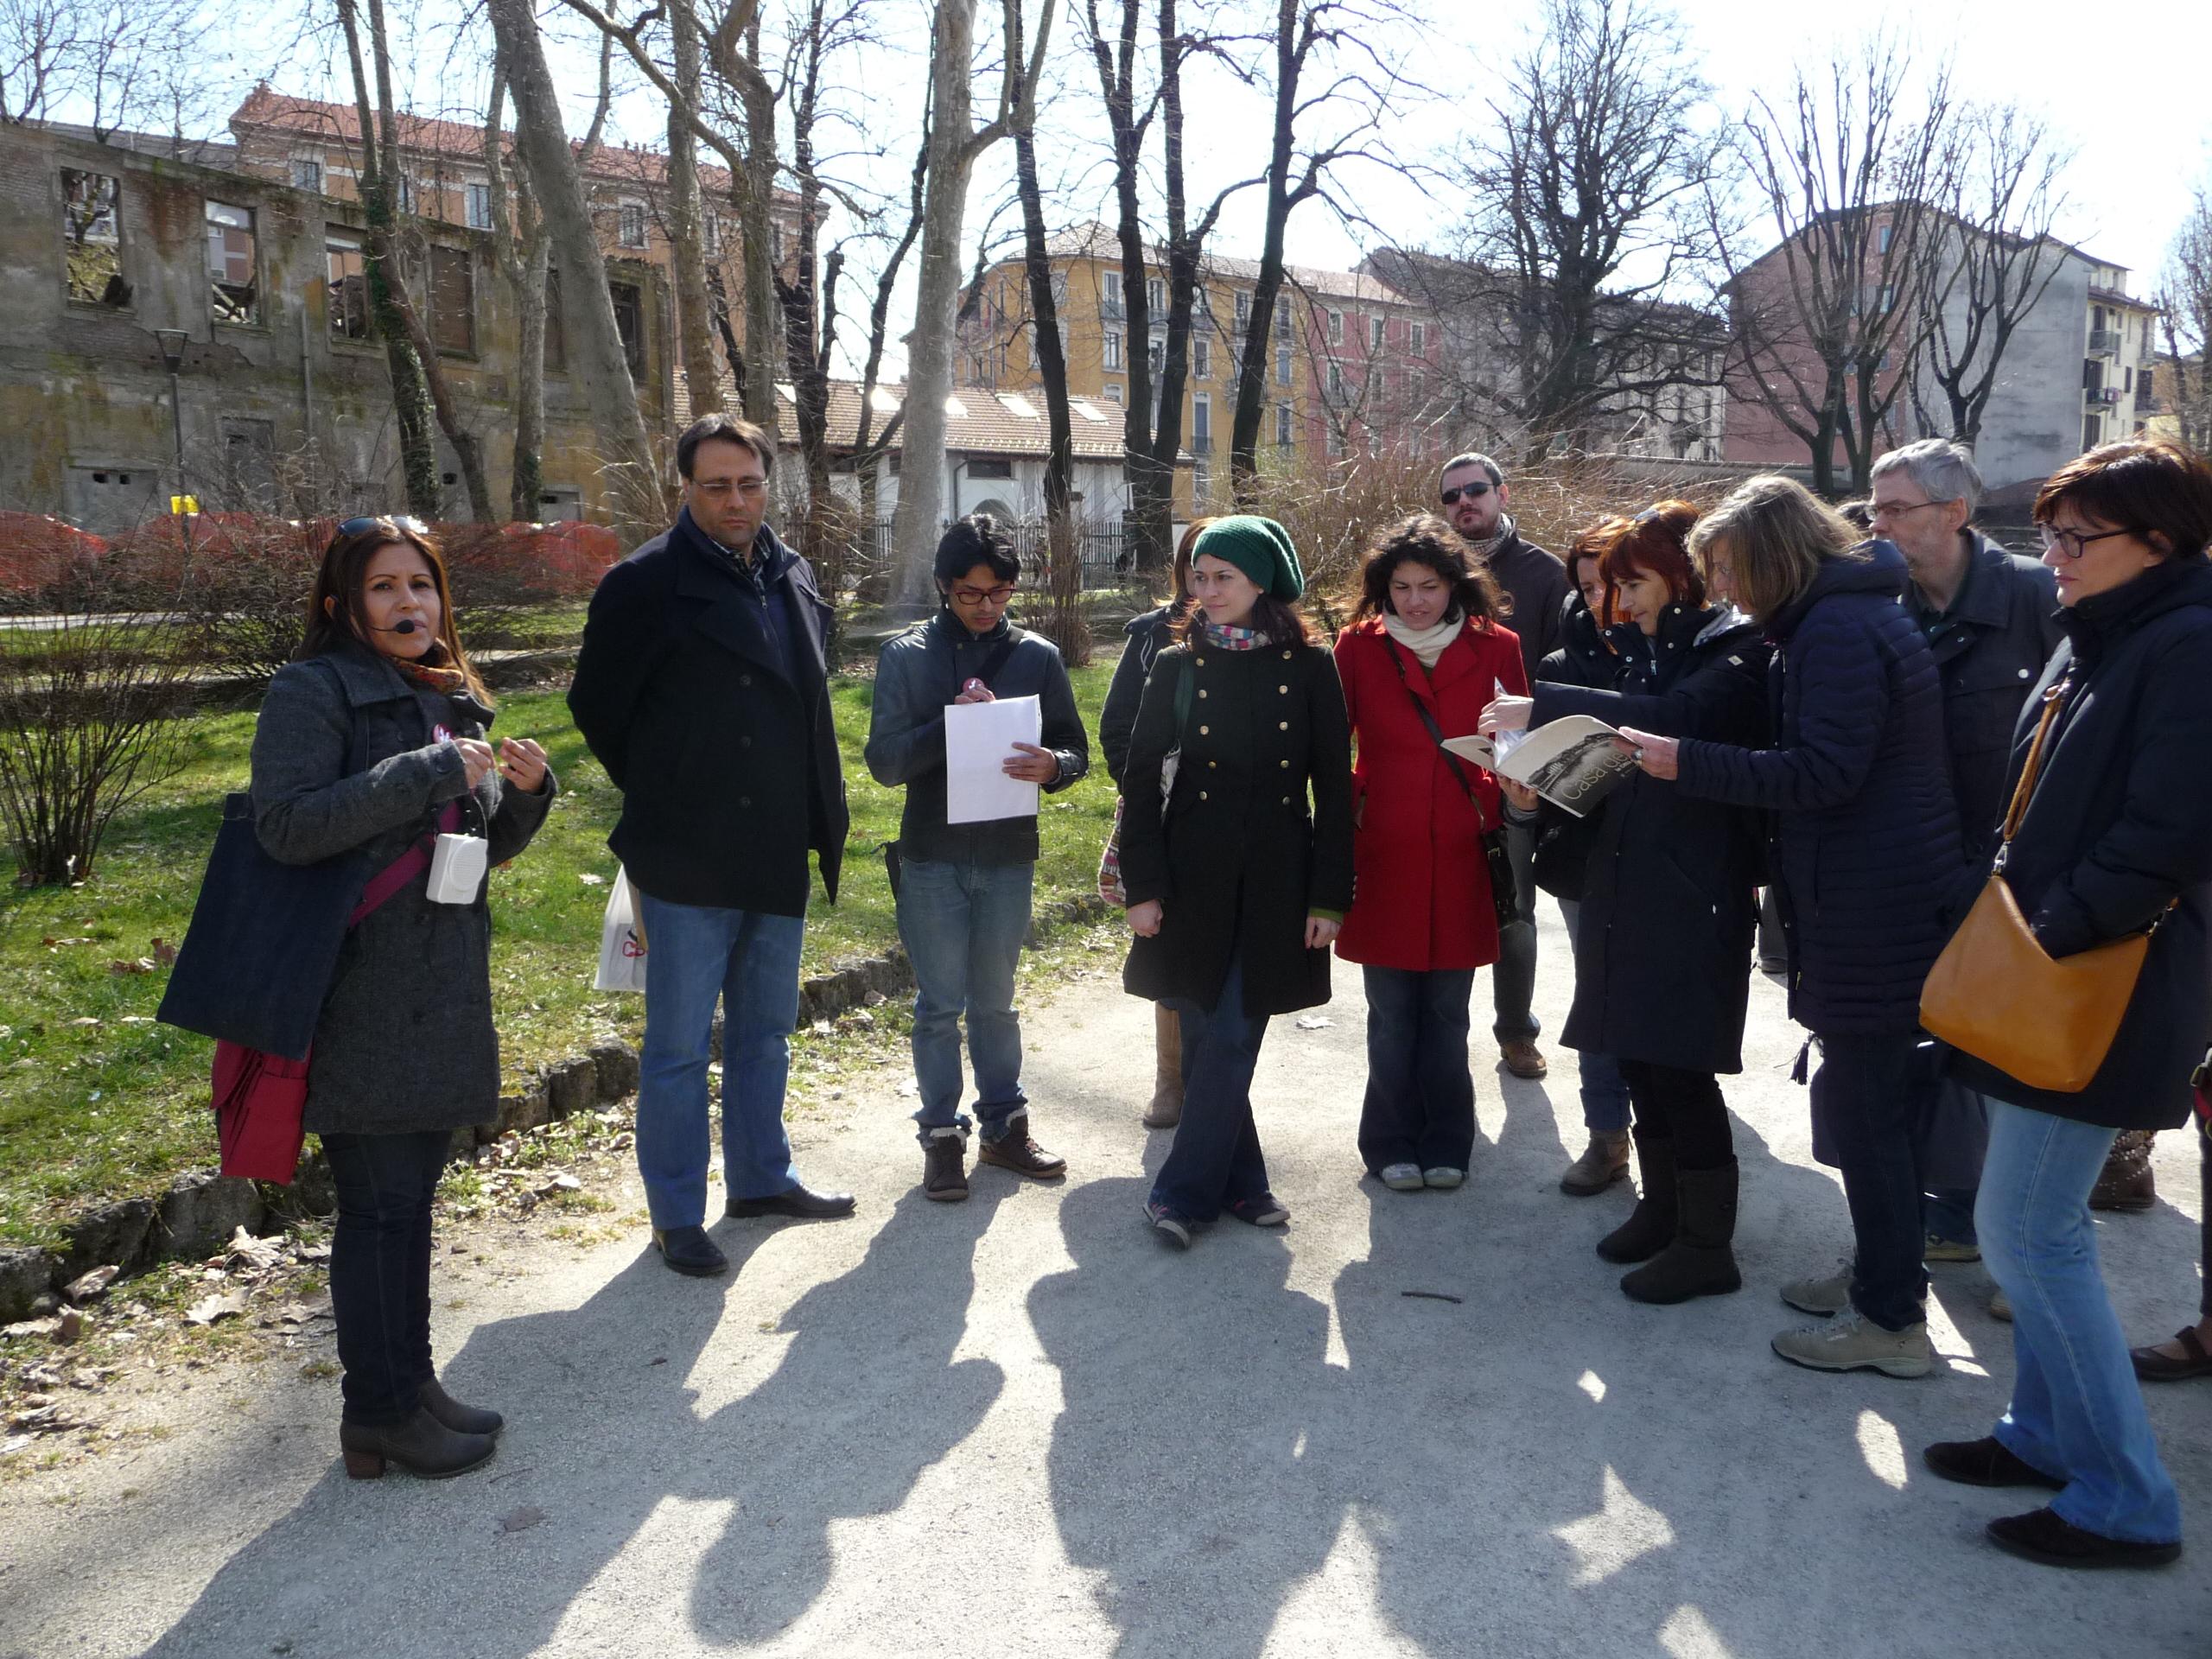 Migrantour Milano: prossime passeggiate gratuite